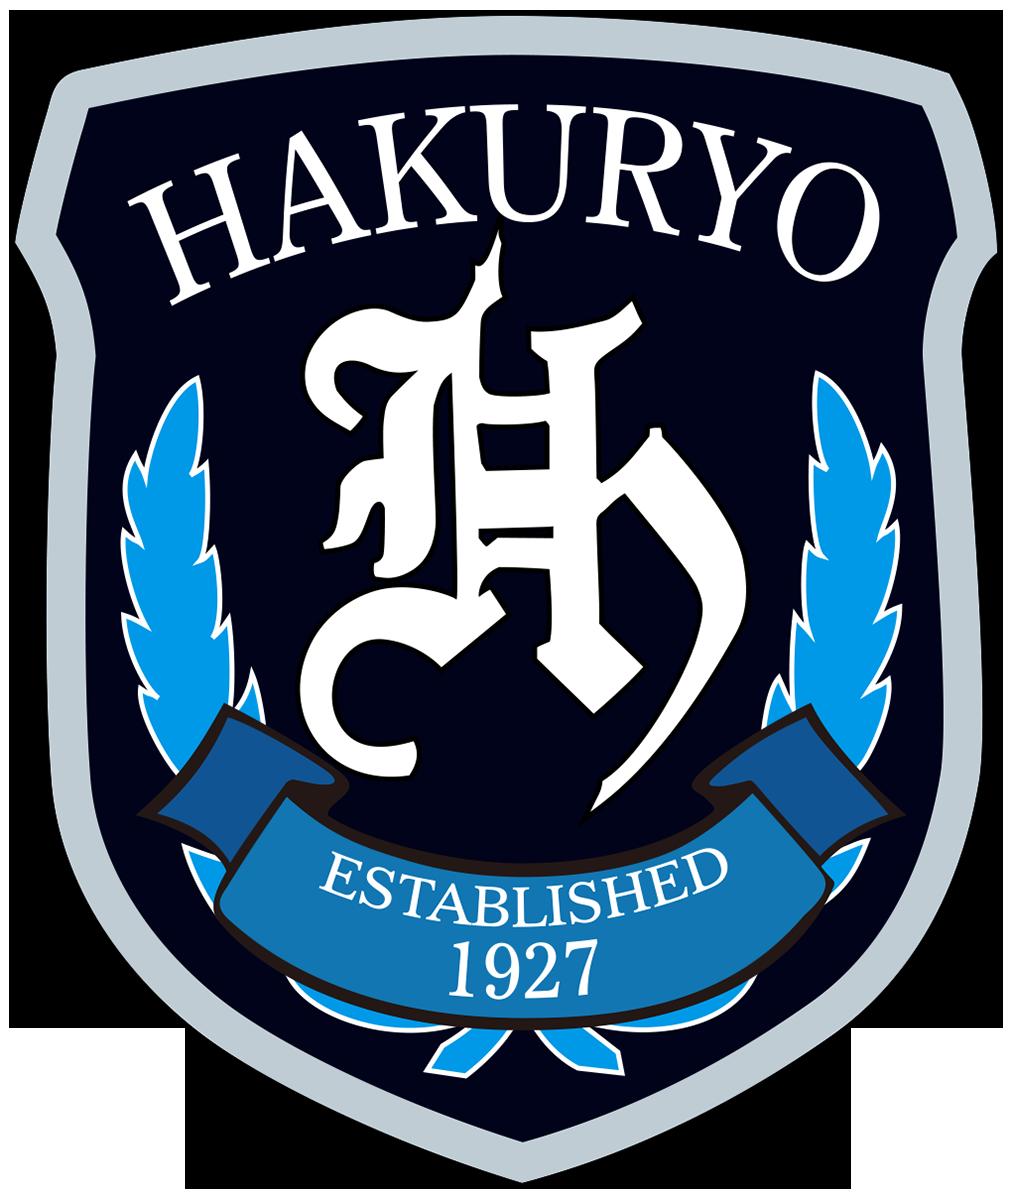 Hakuryo.png